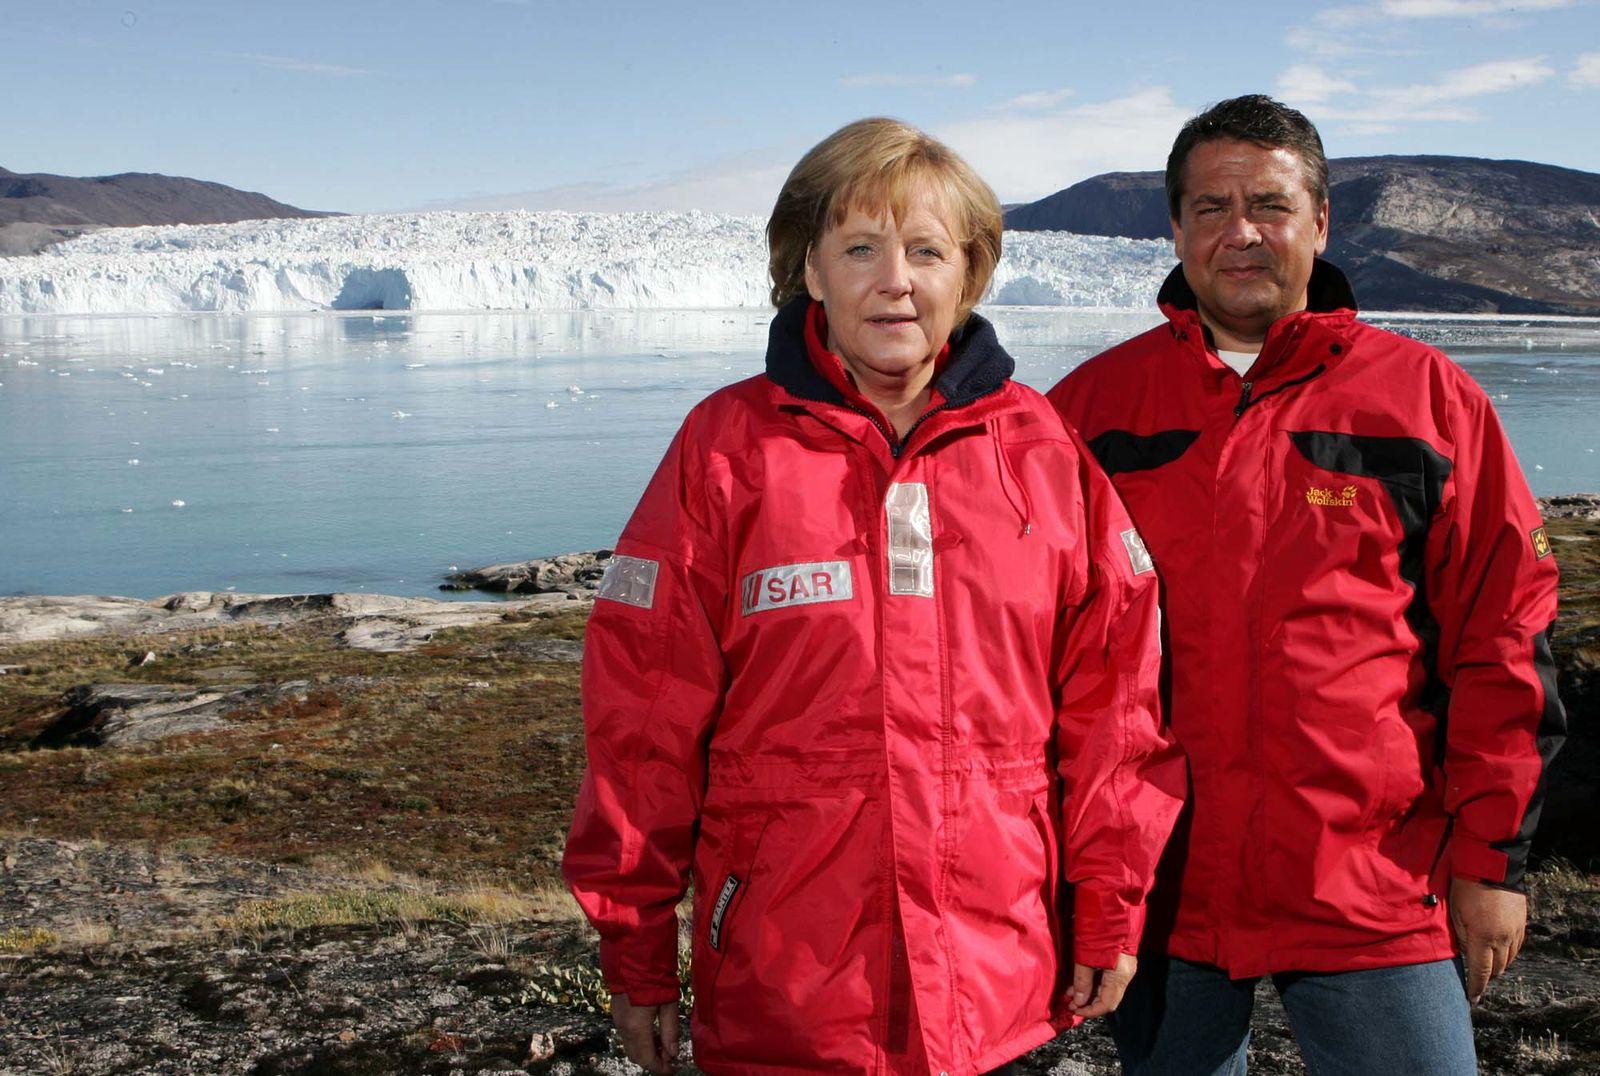 Gabriel Biga/ Merkel und Gabriel in Grönland